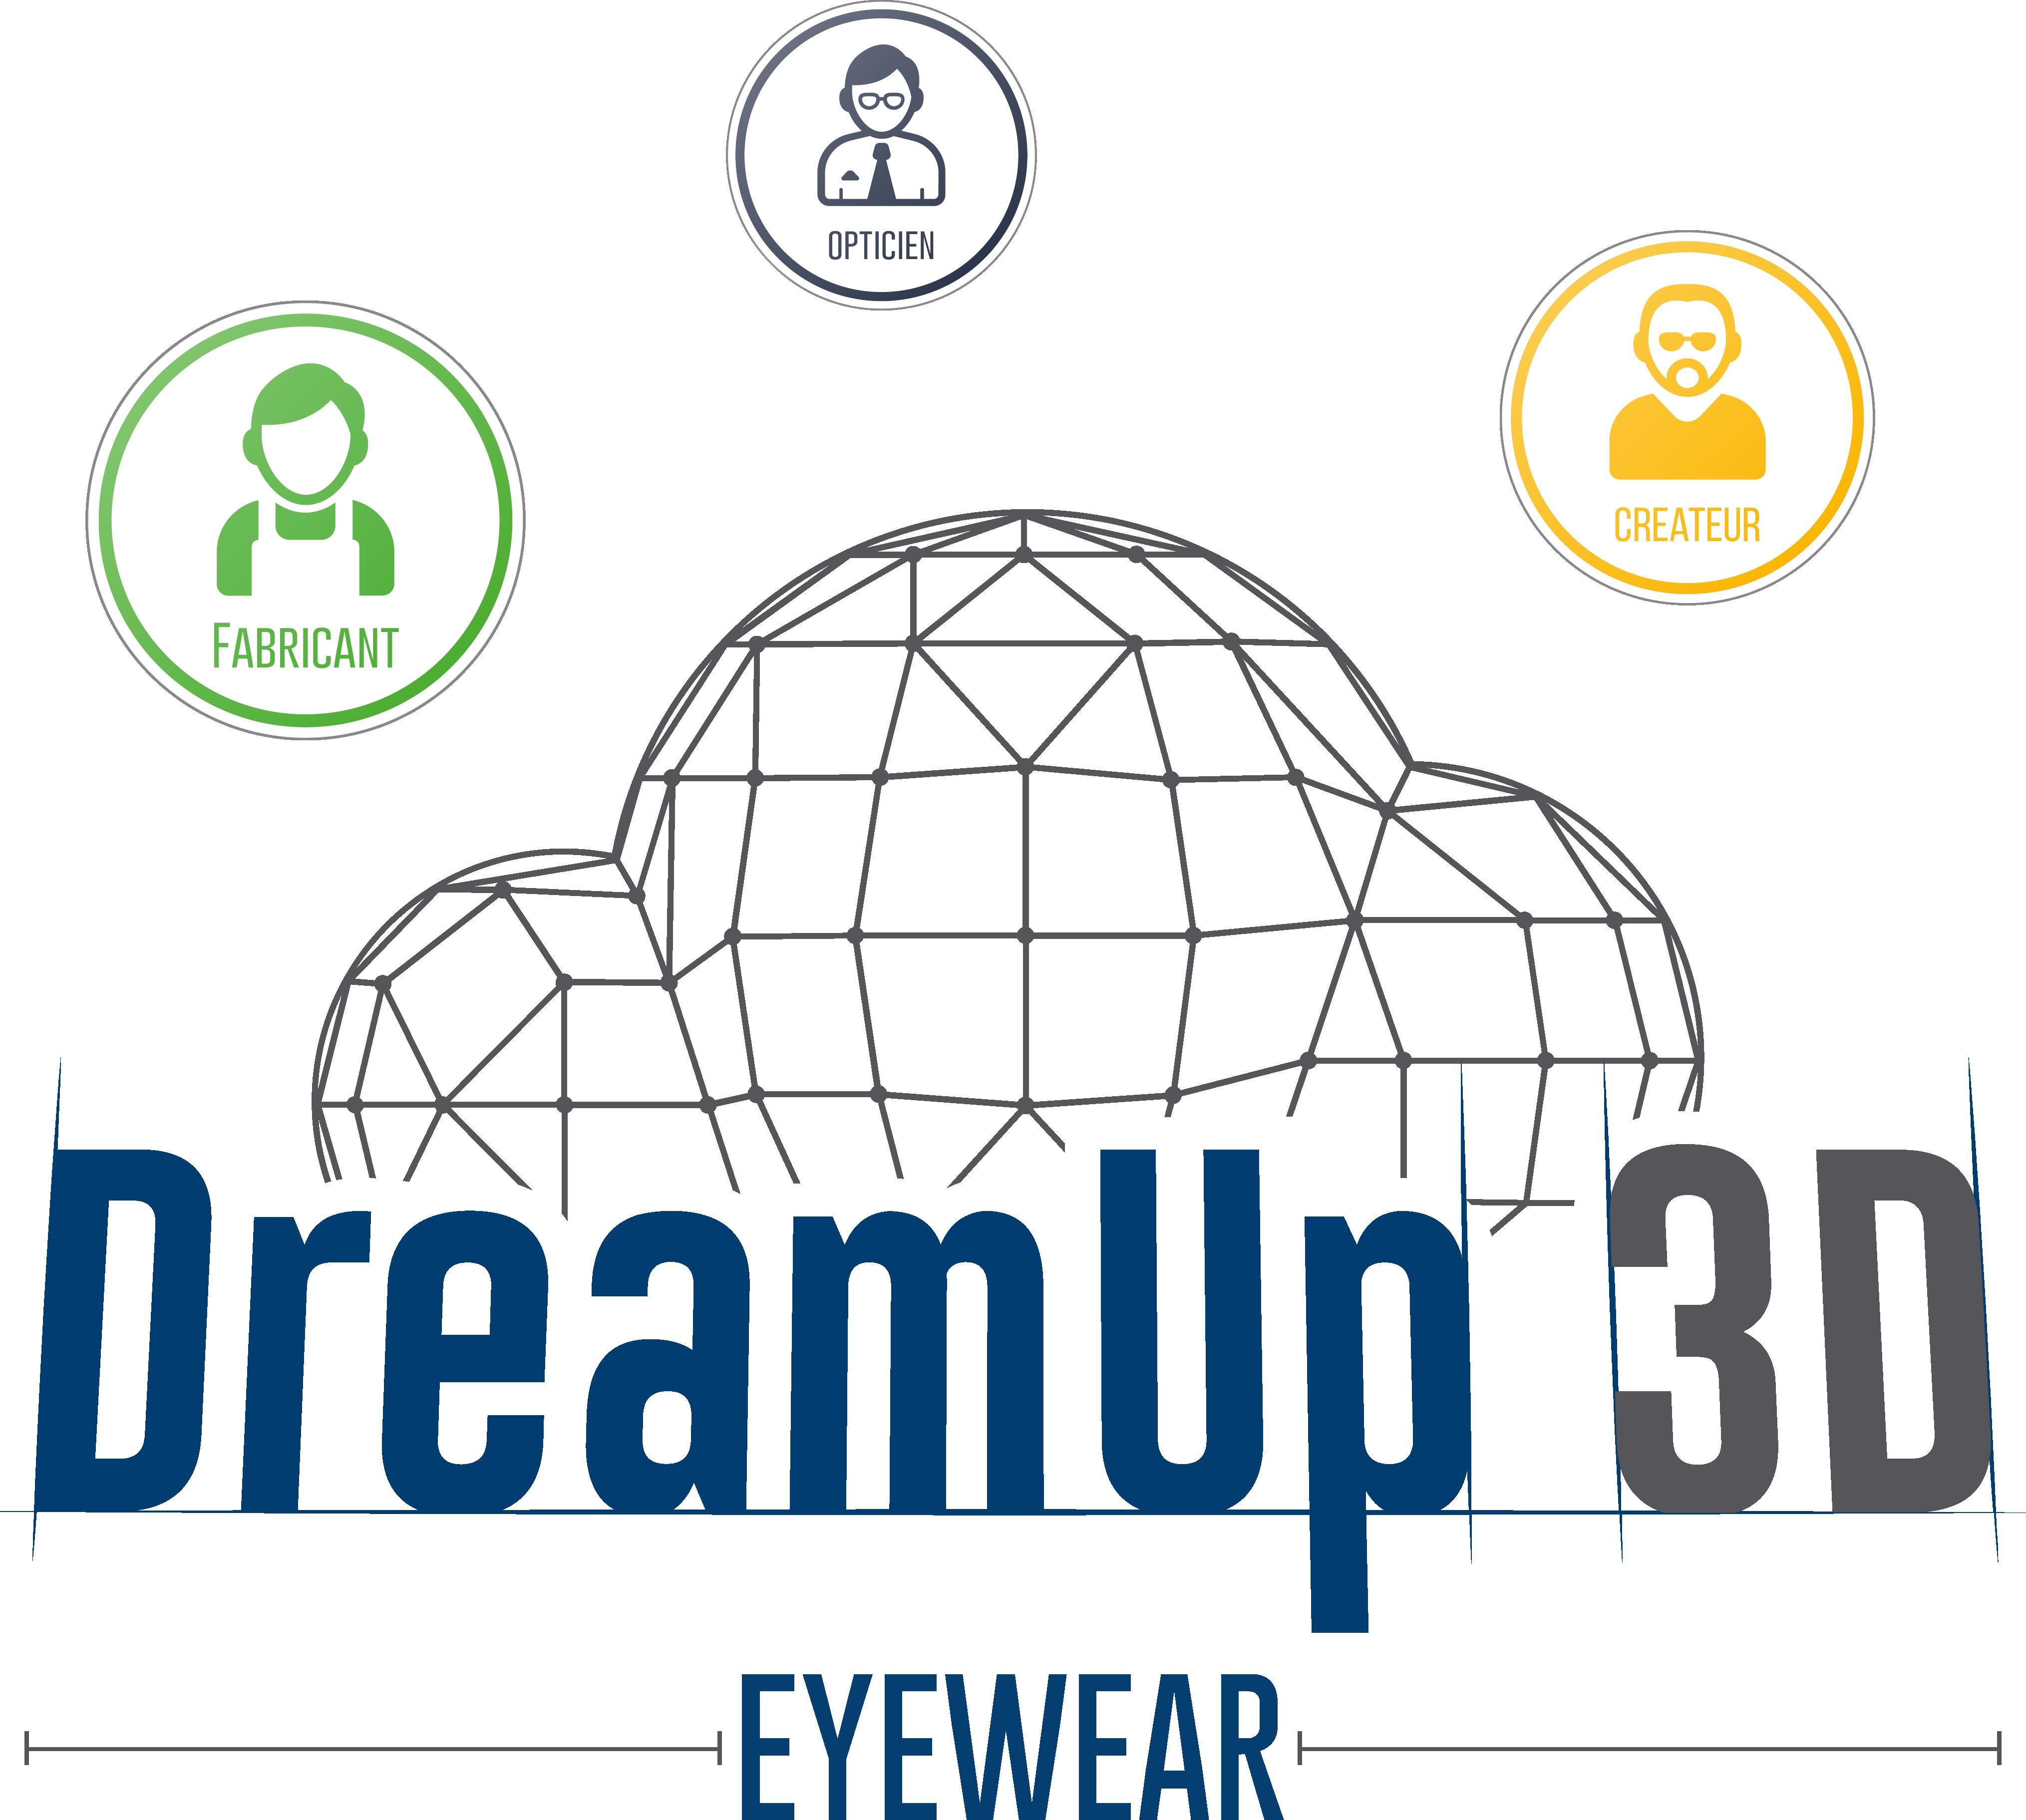 dreamup-3d-eyewear-logo-register-01